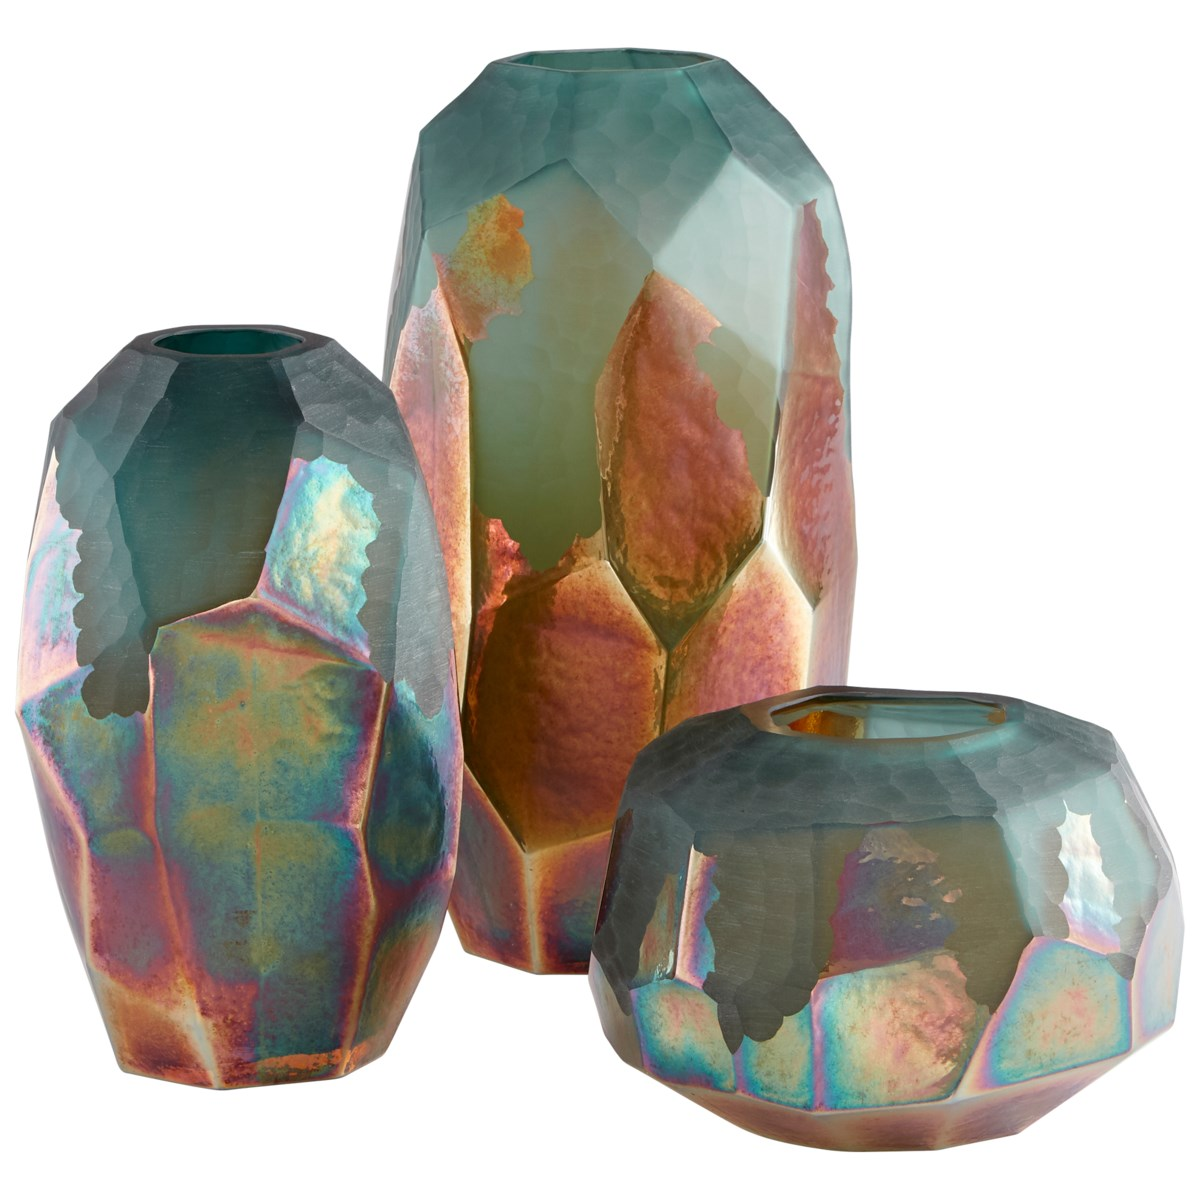 Small Roca Verde Vase